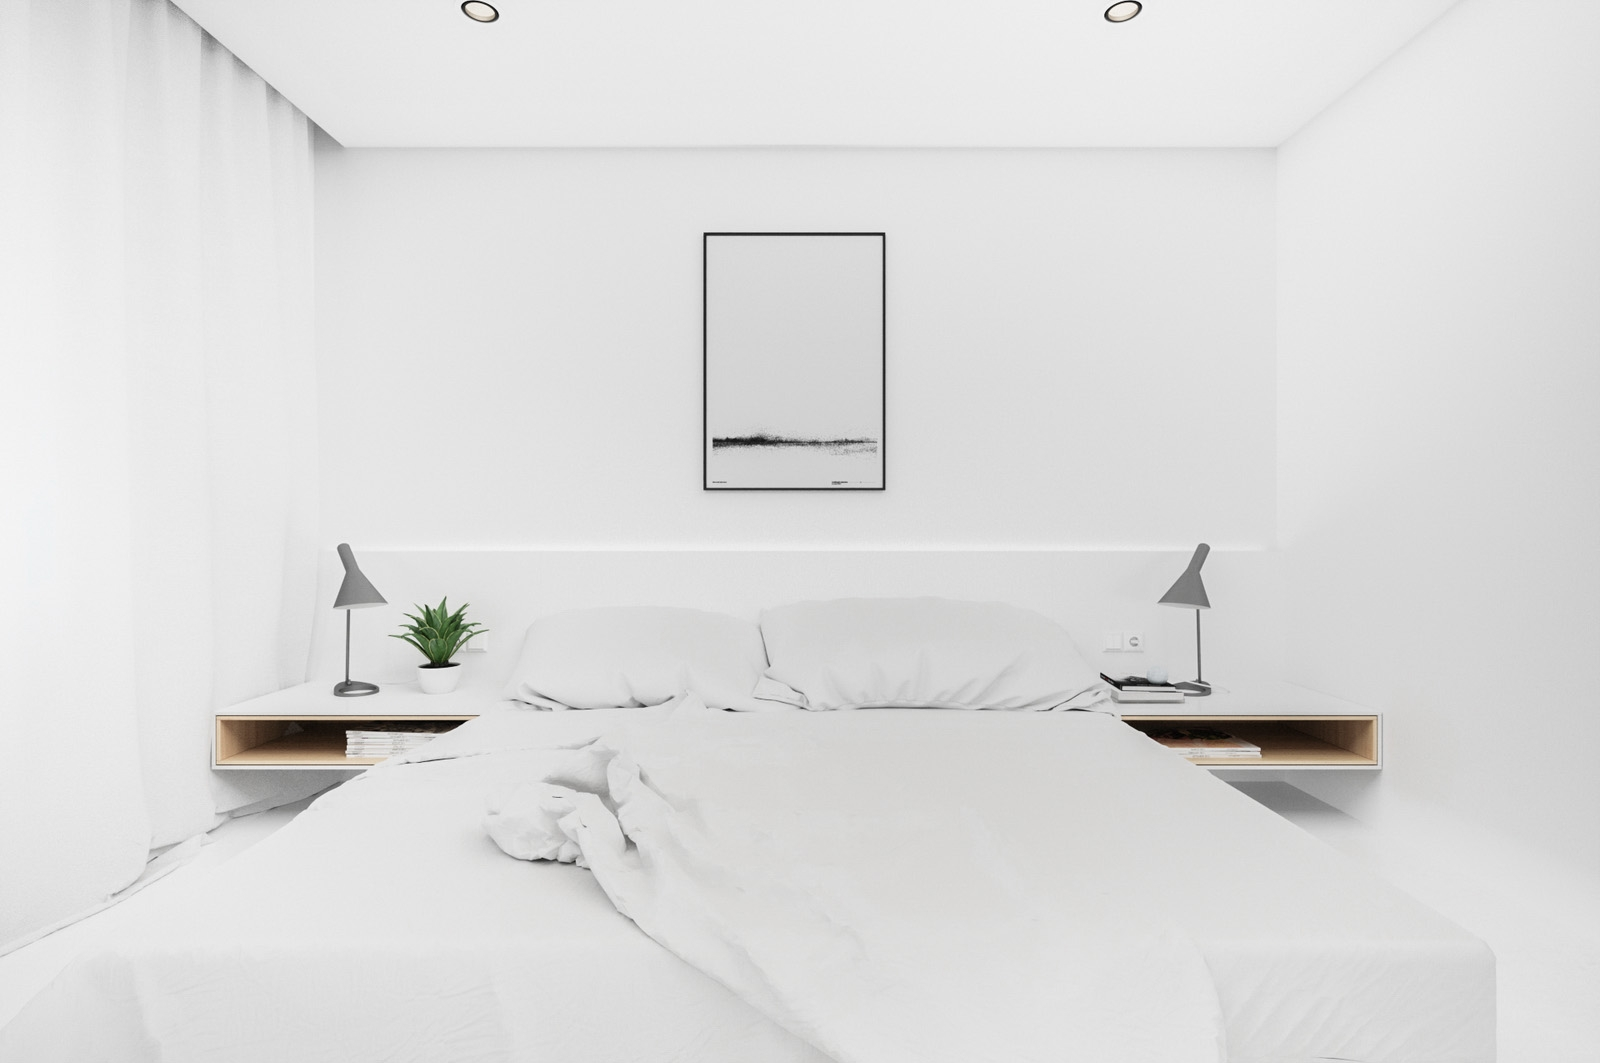 Apartment 62 Andrzej Chomski: m - barenbrug | ello